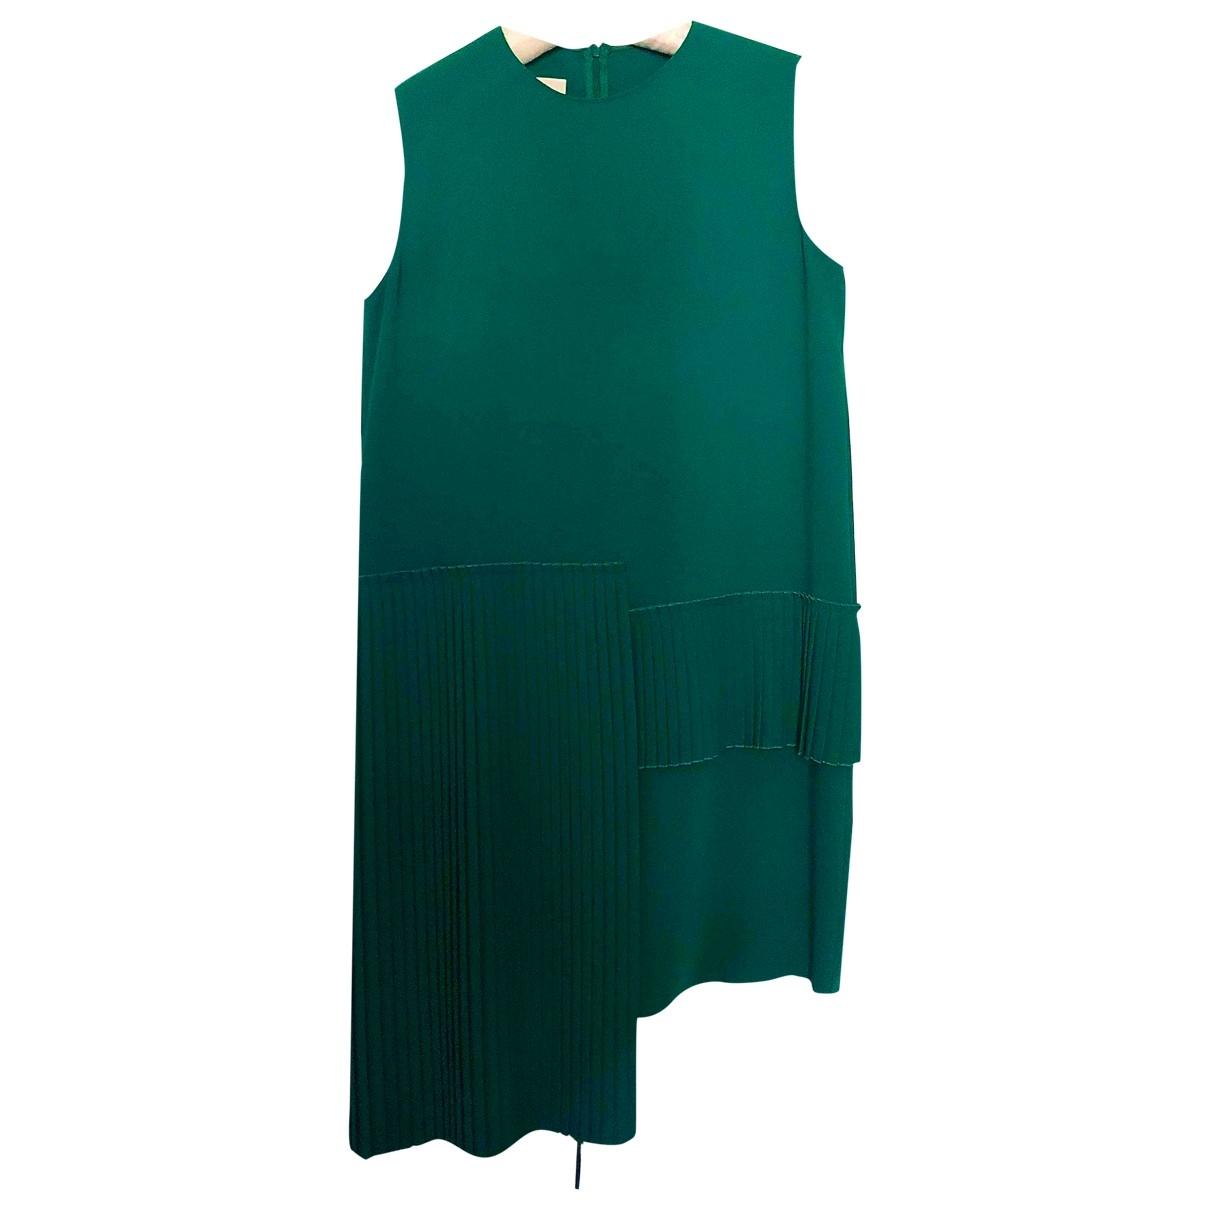 Mm6 \N Kleid in  Gruen Polyester